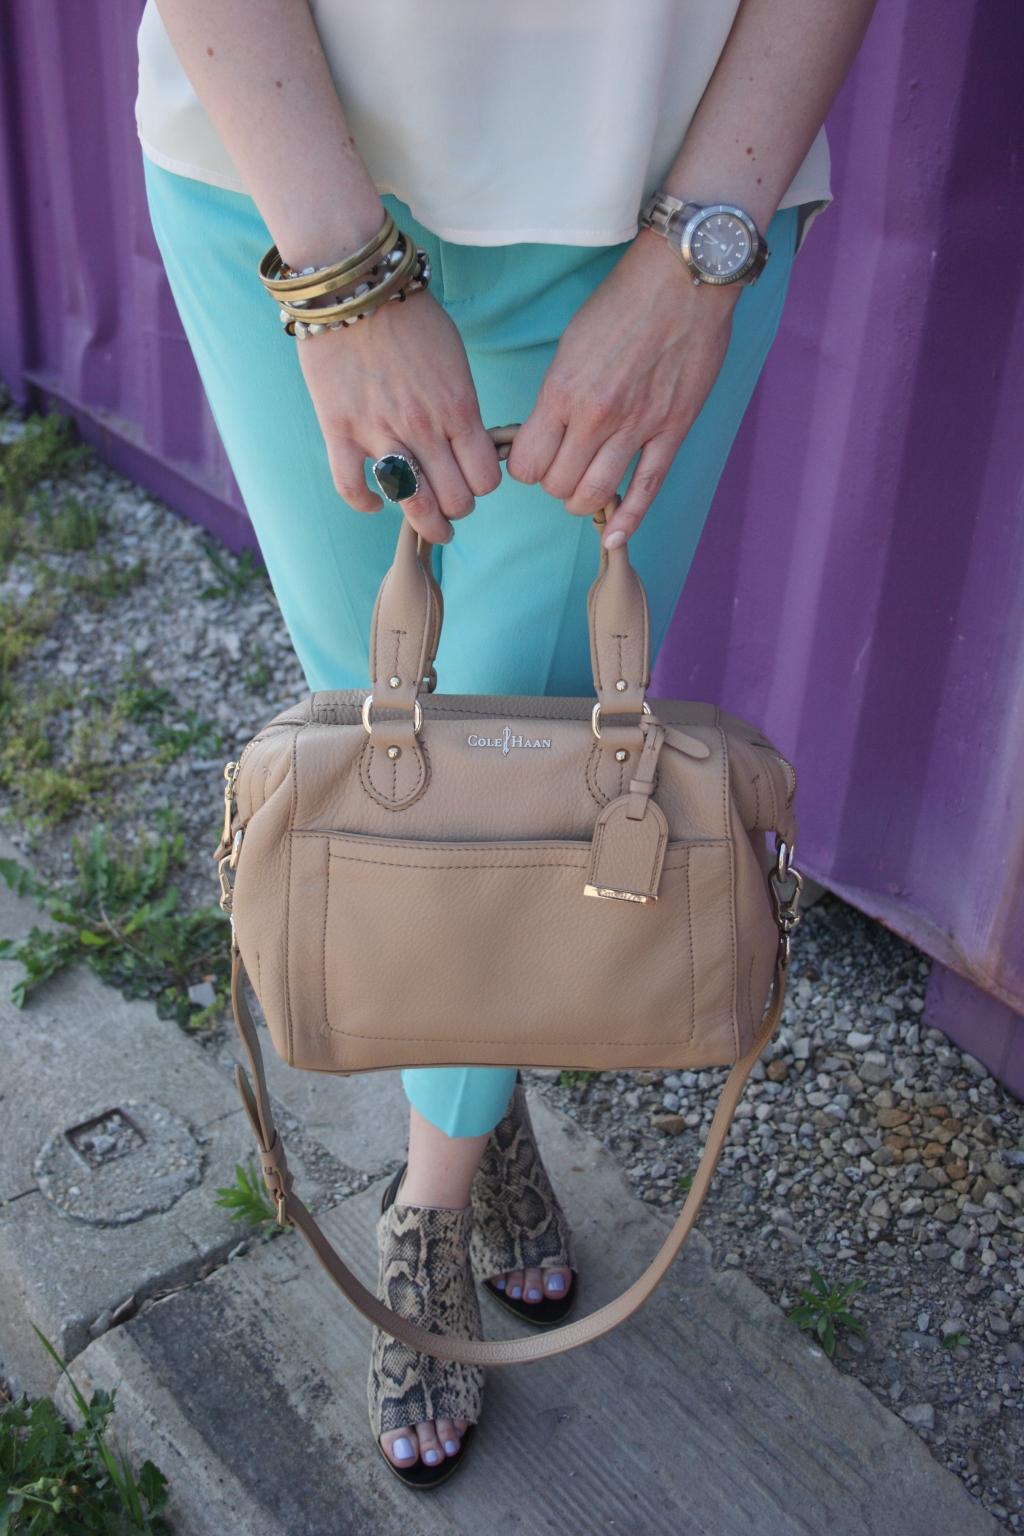 Cole Haan Handbag, Silpada Jewelry, Fossil Watch, Cynthia Rowley Capri